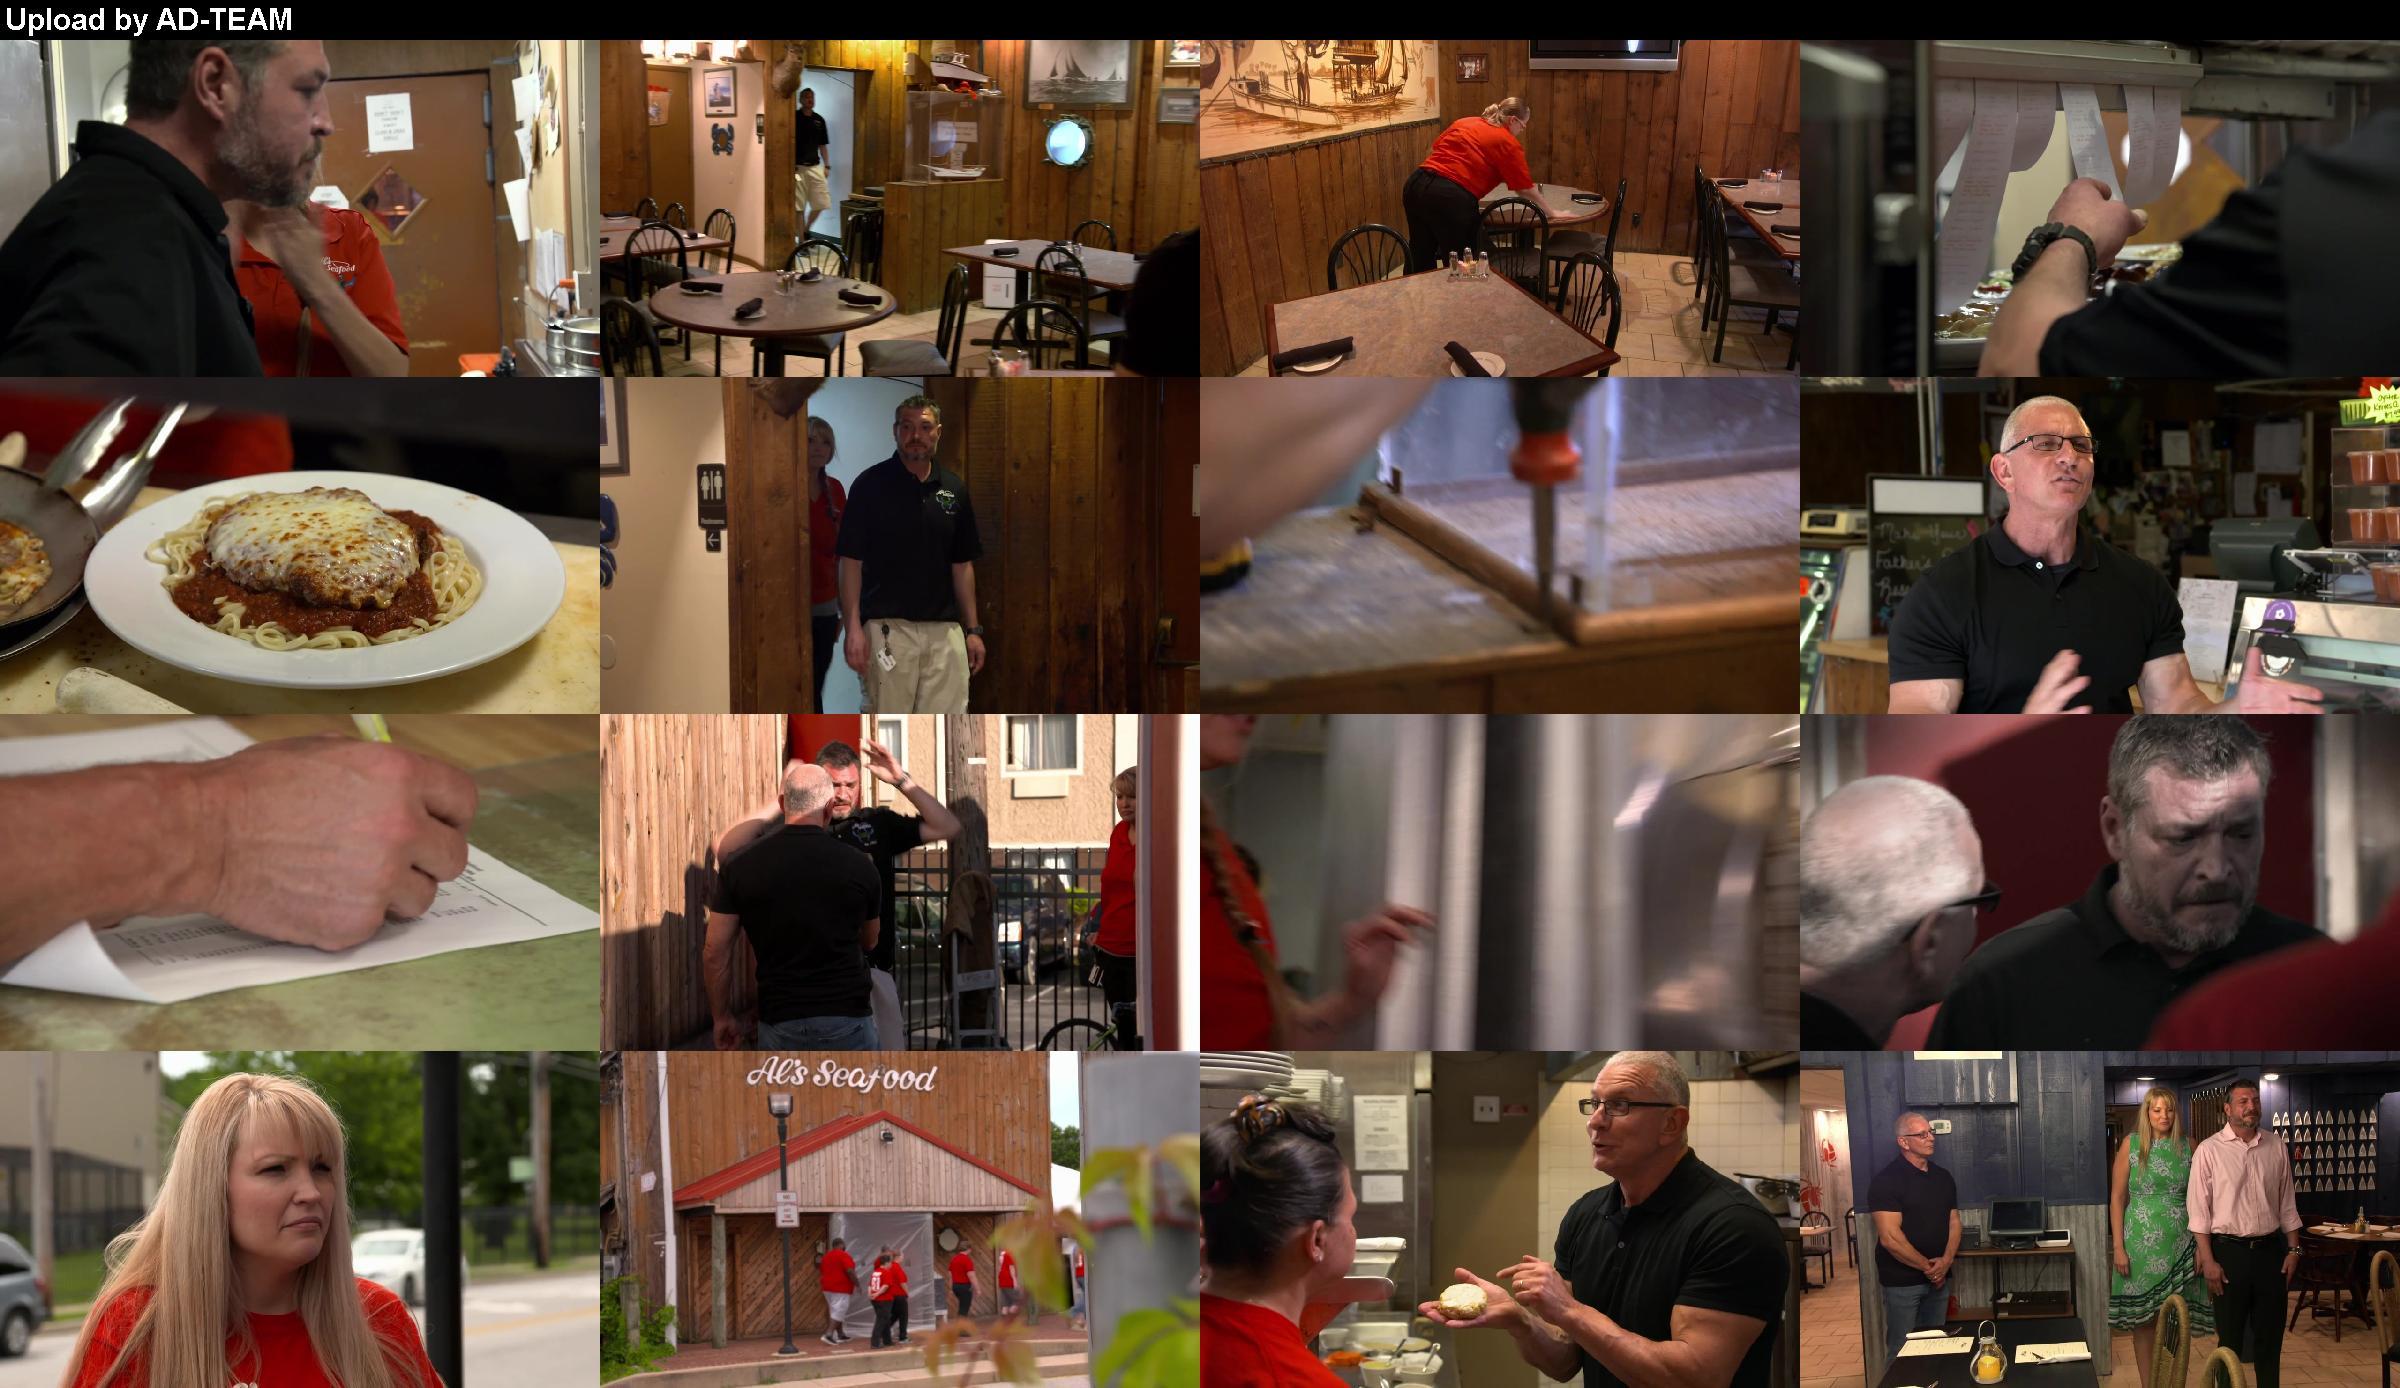 Restaurant Impossible S15e06 Saving A Familys Legacy 720p Webrip X264-caffeine